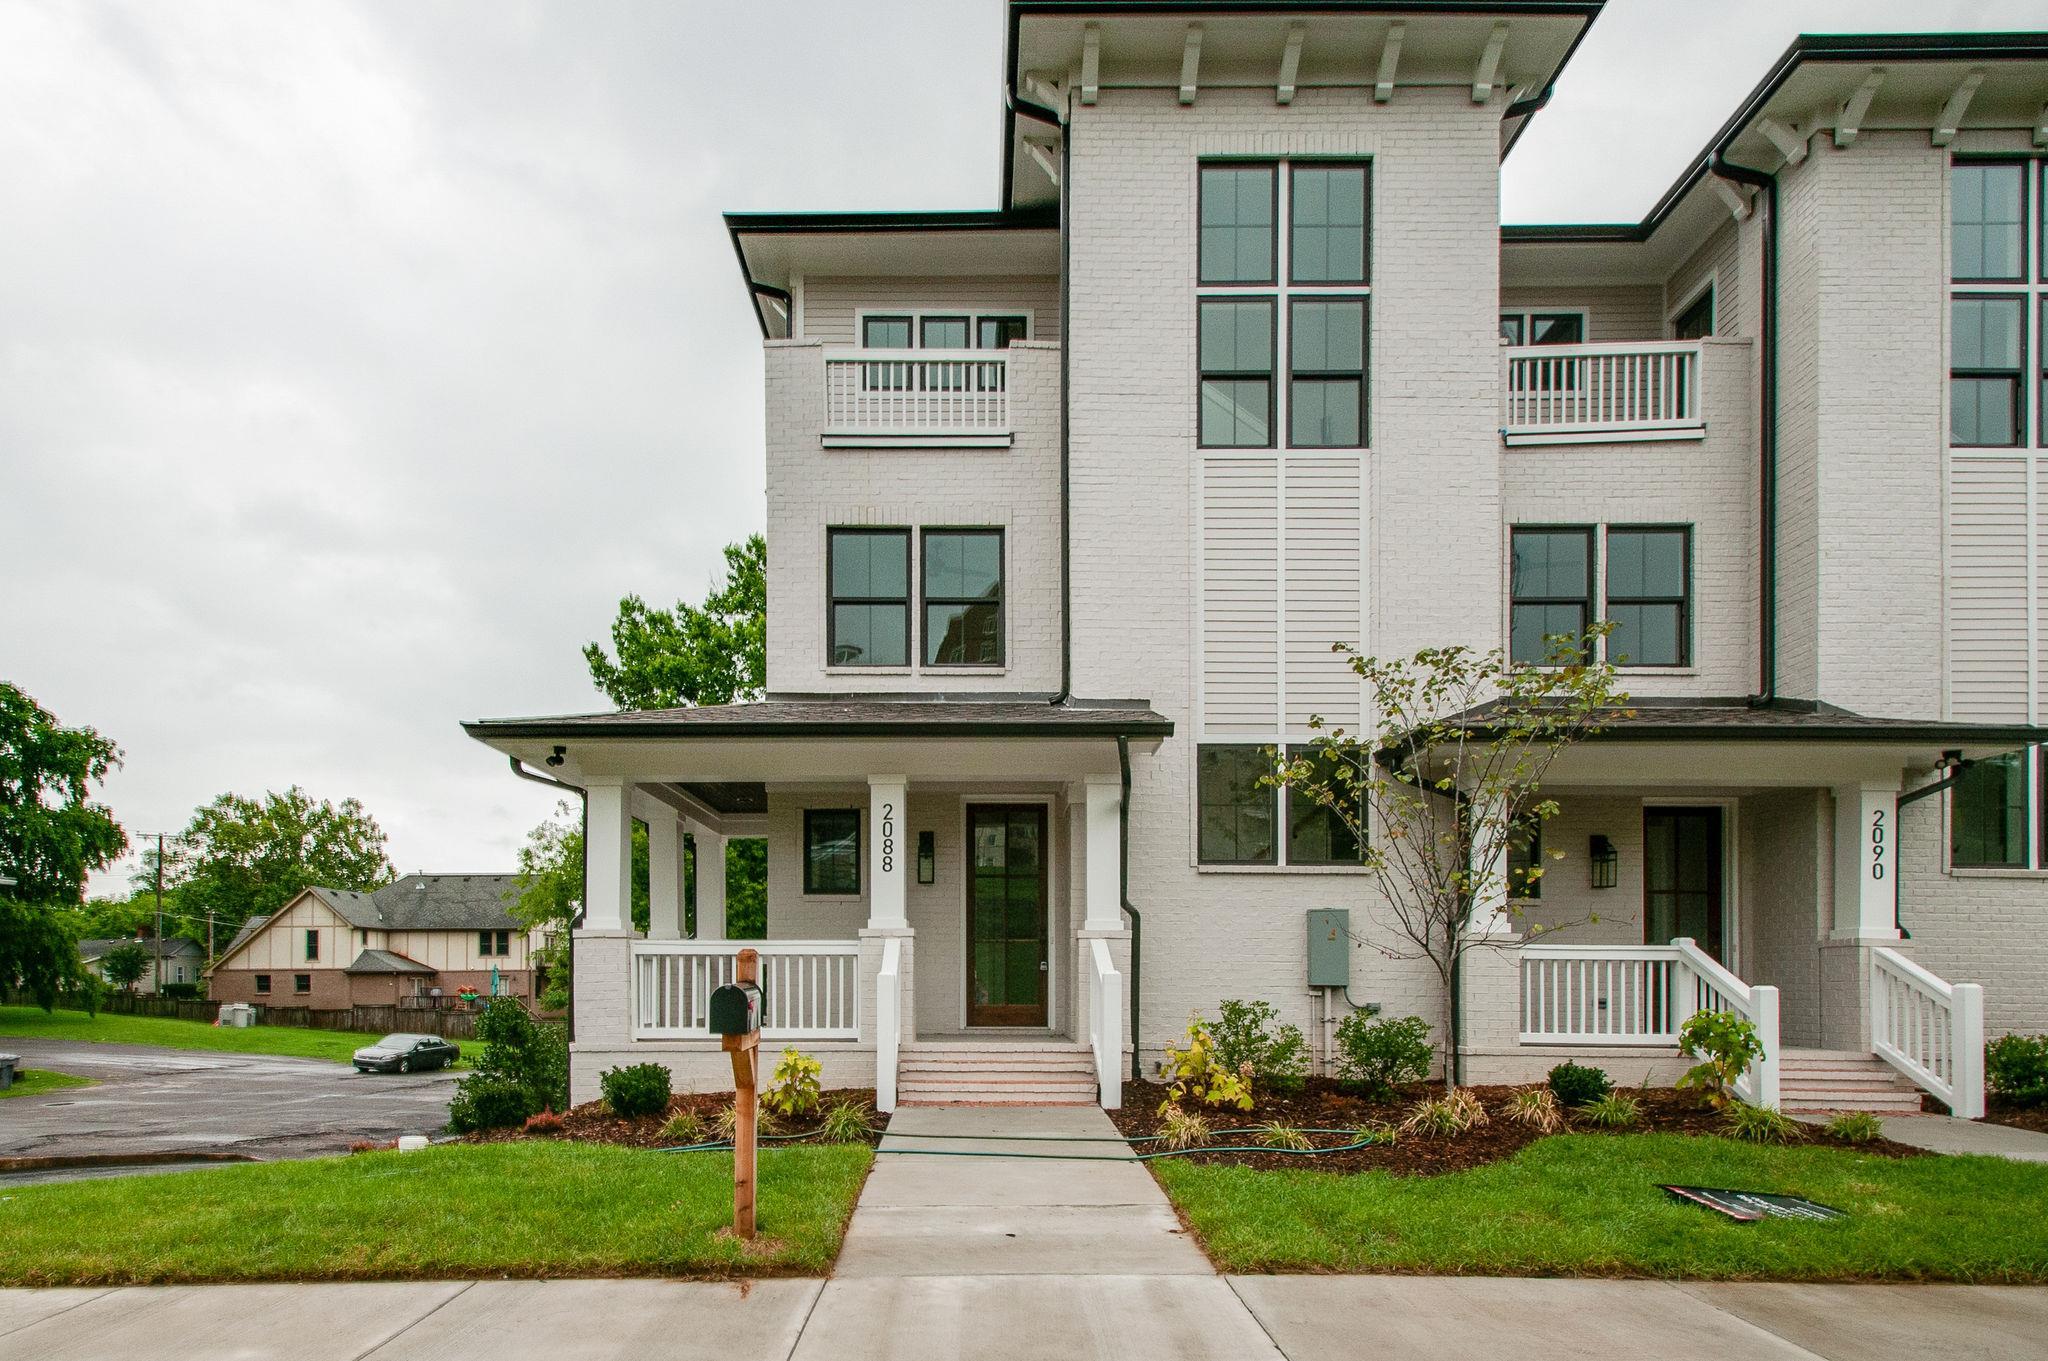 2088 12Th Ave S, Nashville, TN 37204 - Nashville, TN real estate listing